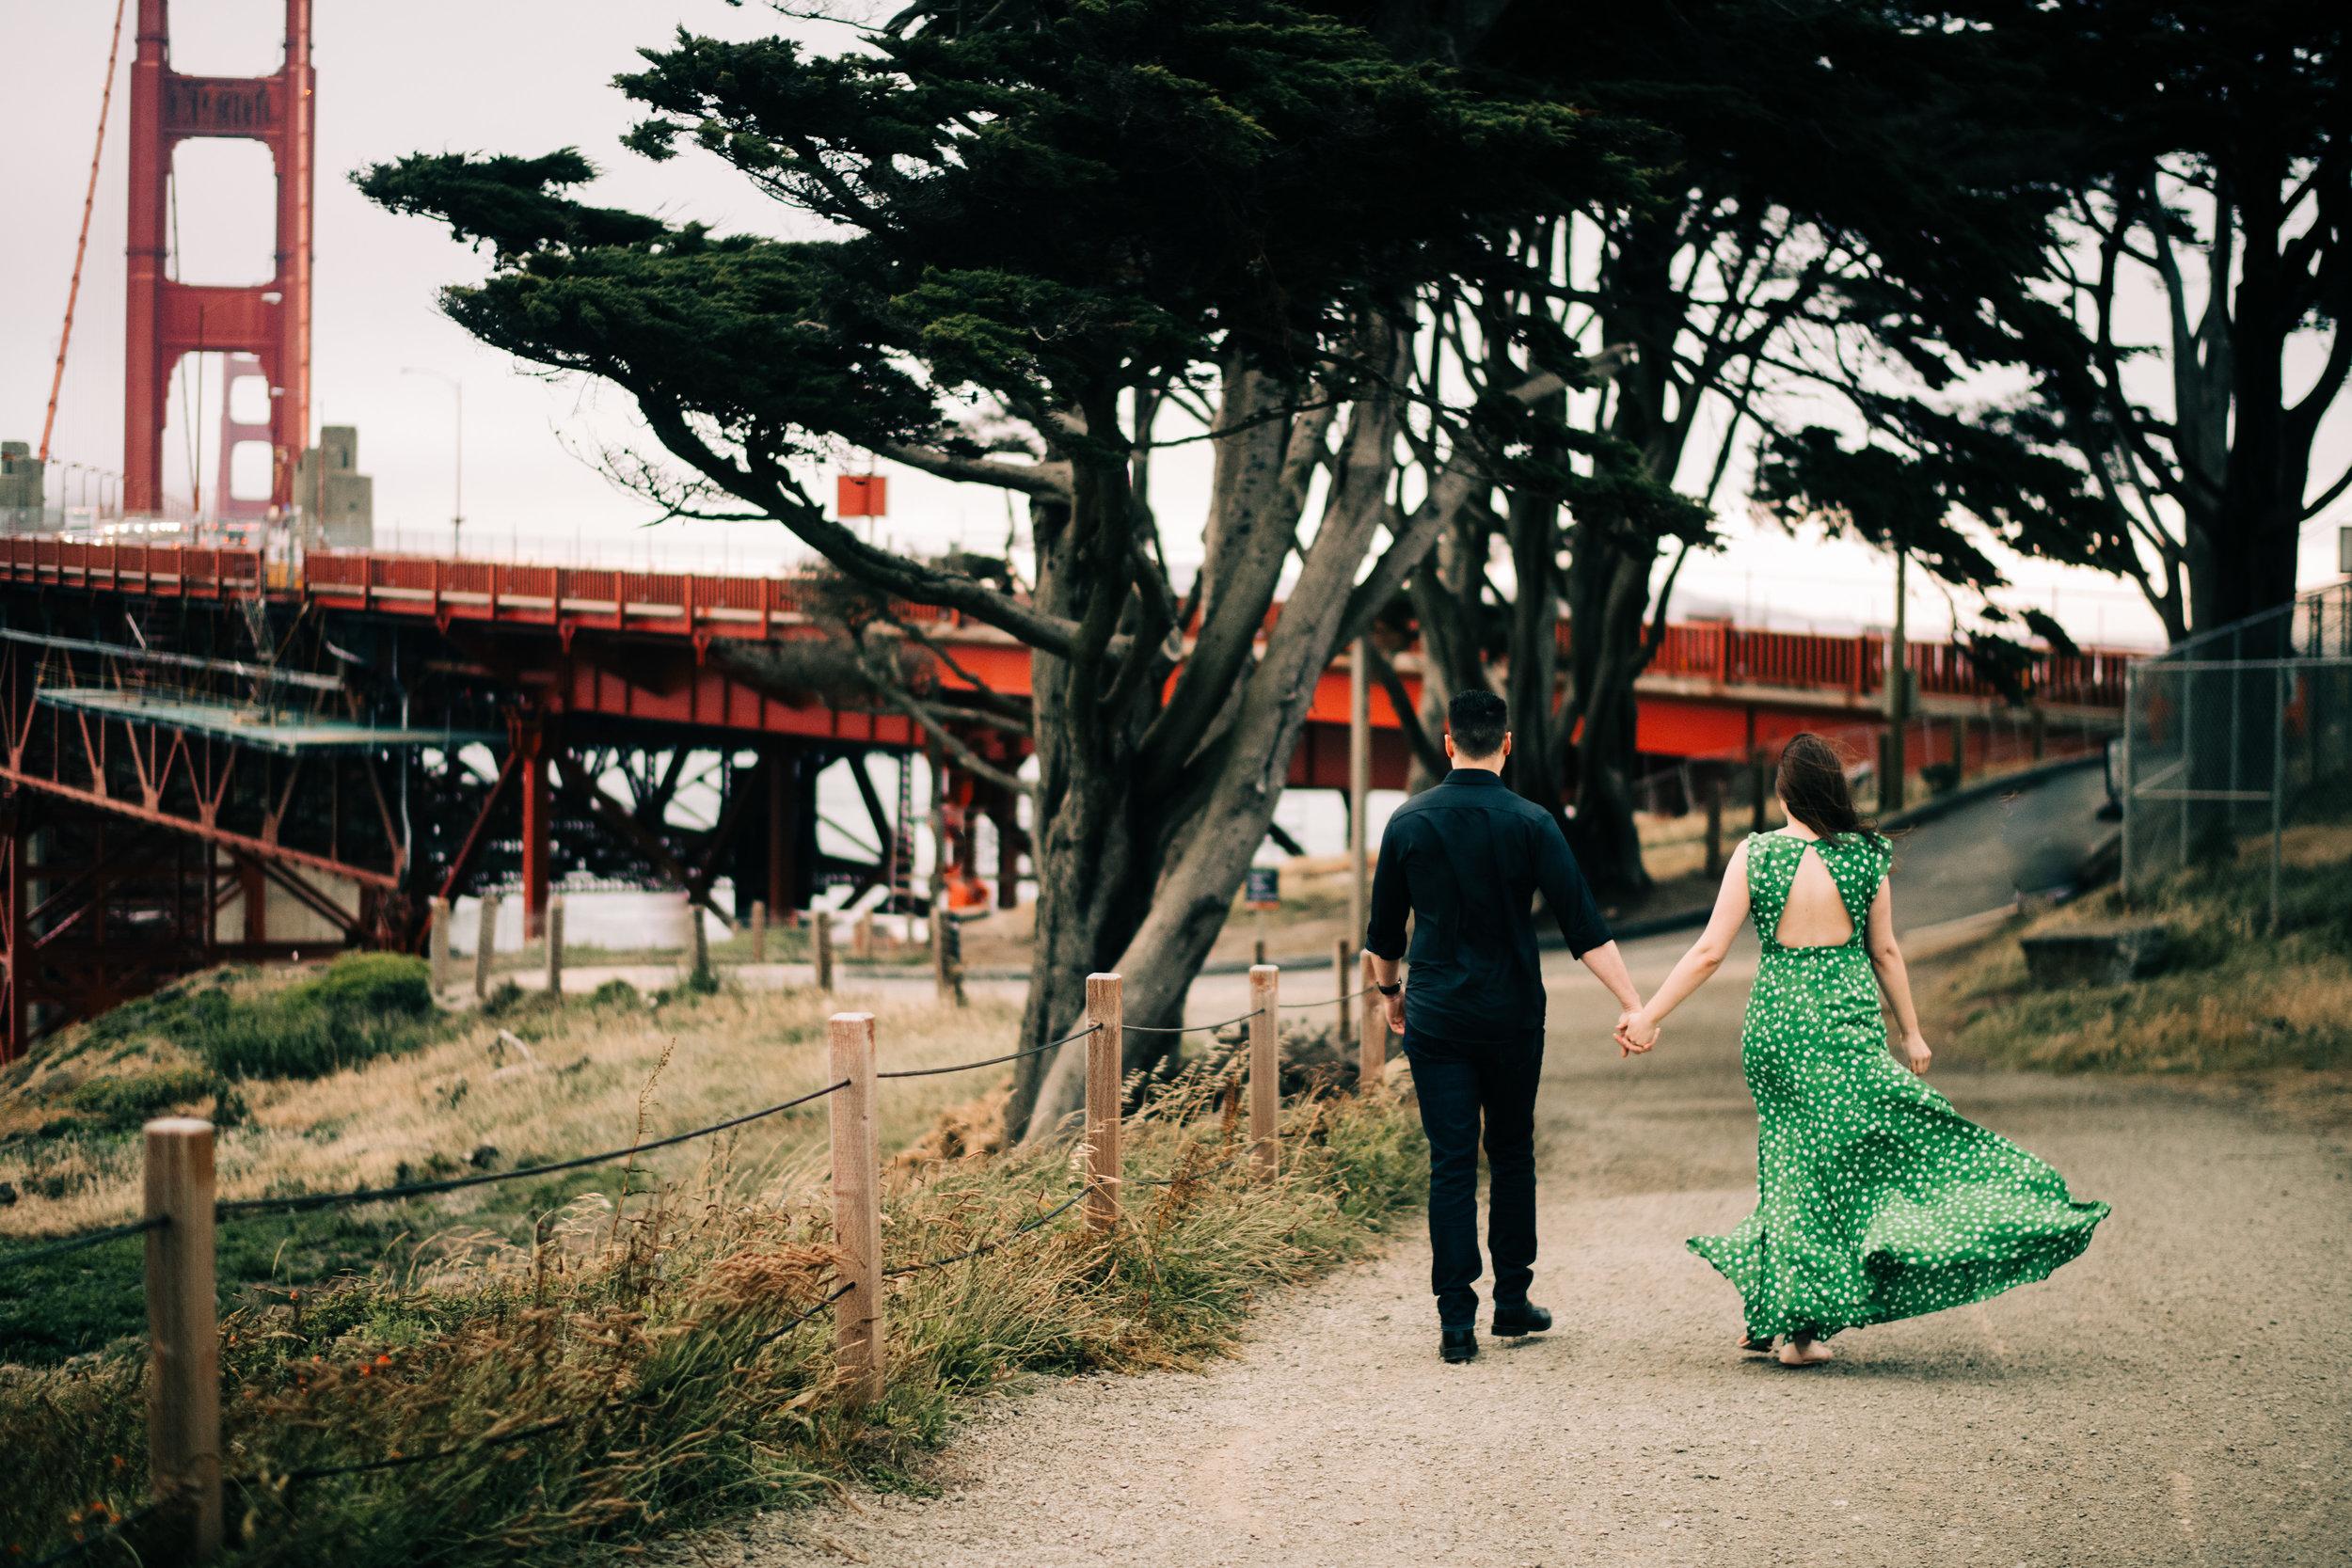 bay area lands end sutro baths oakland san francisco engagement wedding nontraditional fun creative eclectic photographer magic-445.jpg